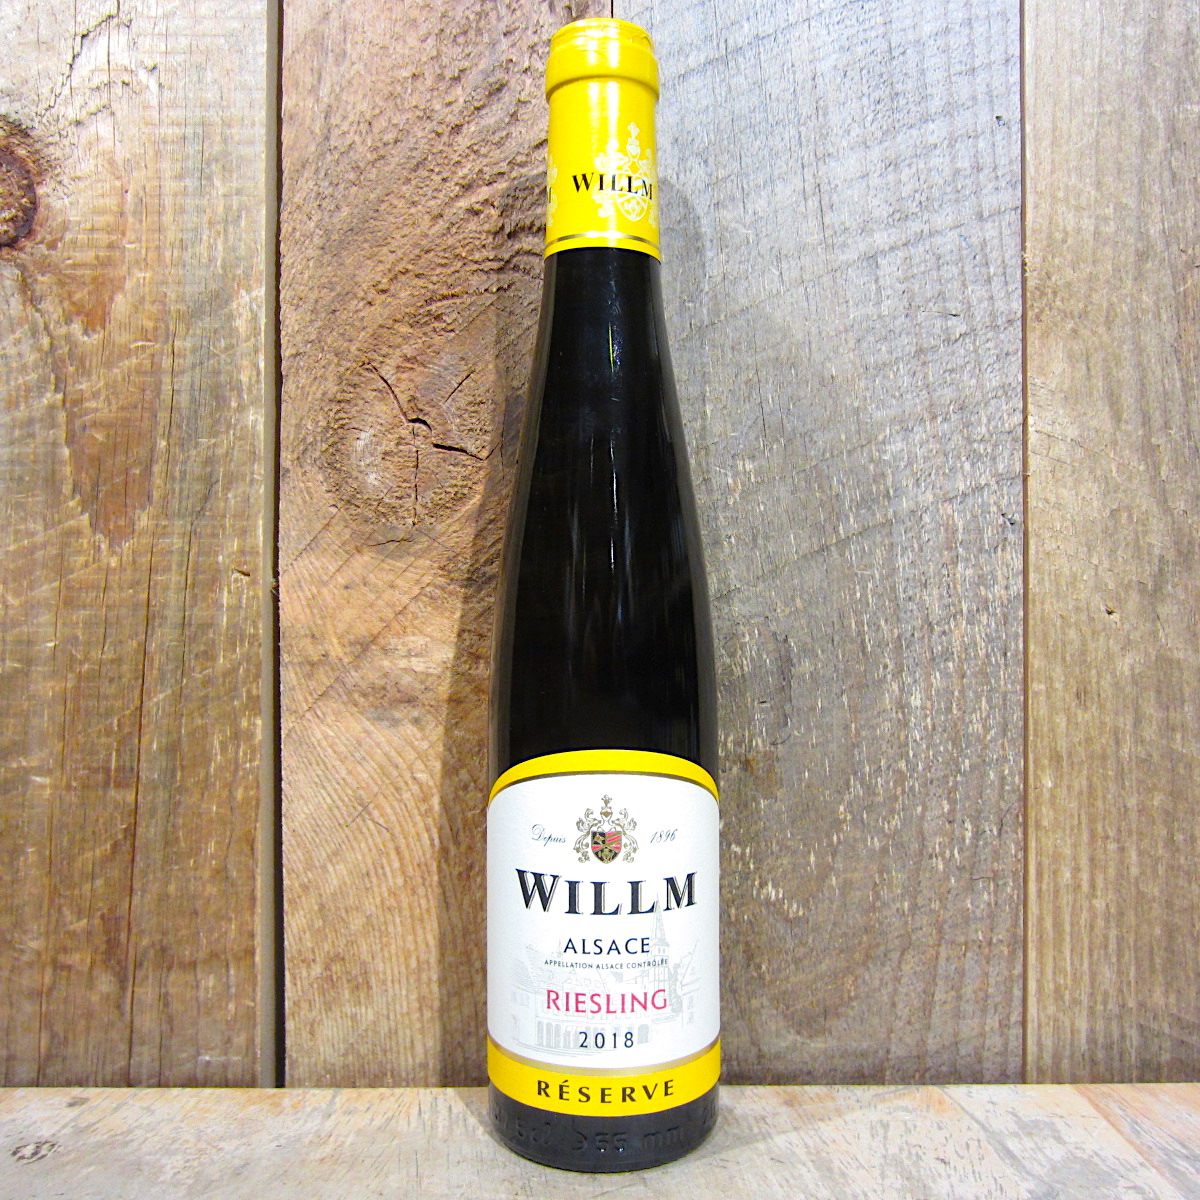 Willm Riesling 2018 375ml (Half Size Btl)